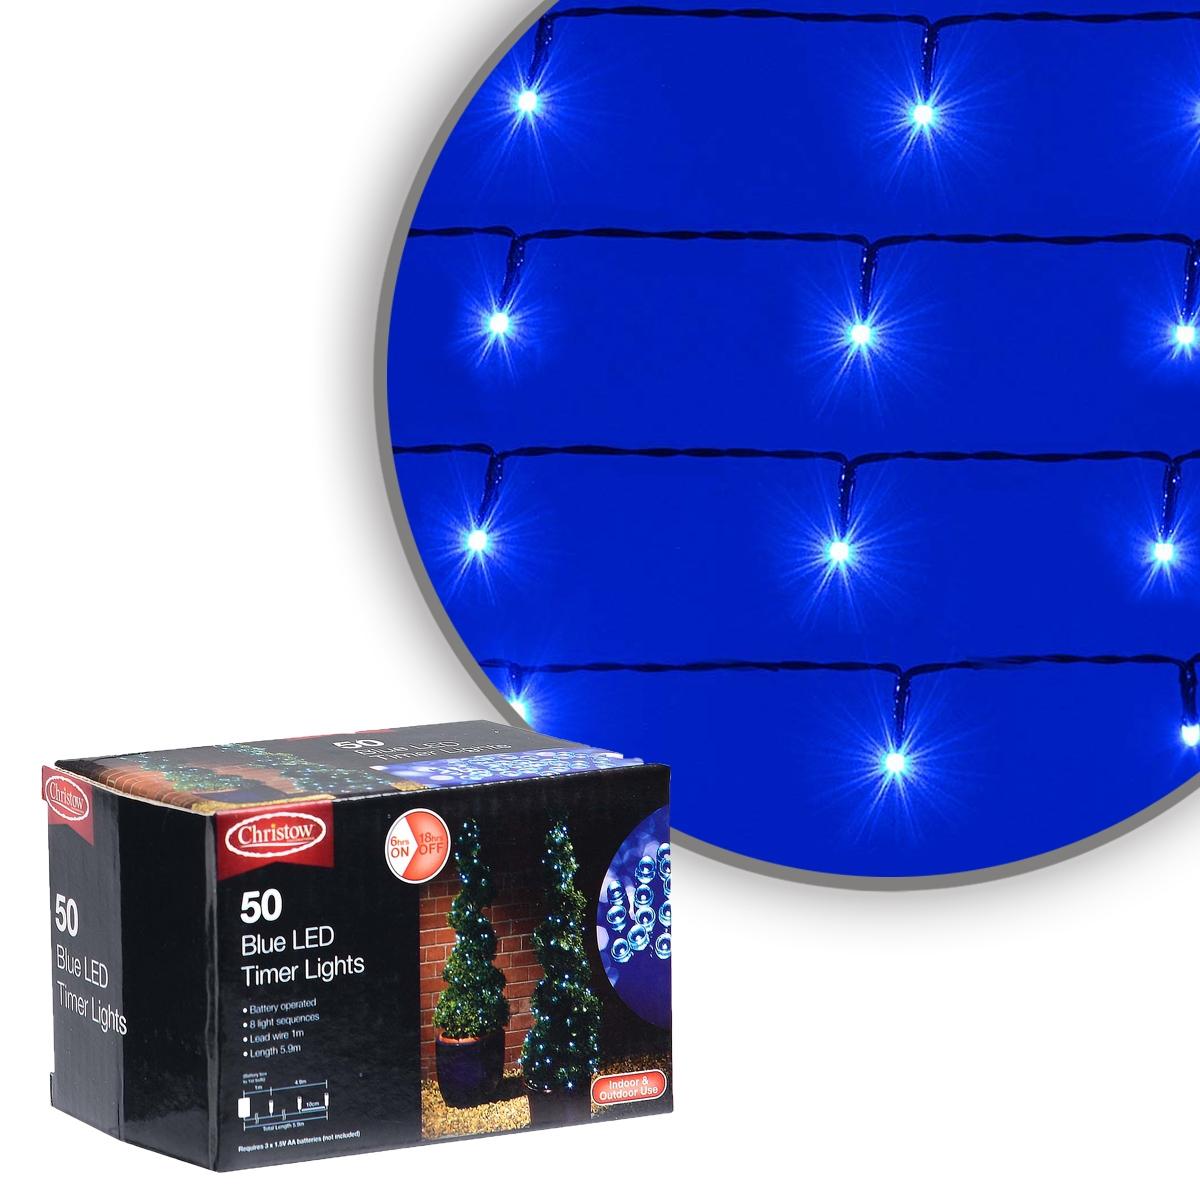 Image of Blue 50 LED Battery Multi-Function Christmas Timer Lights